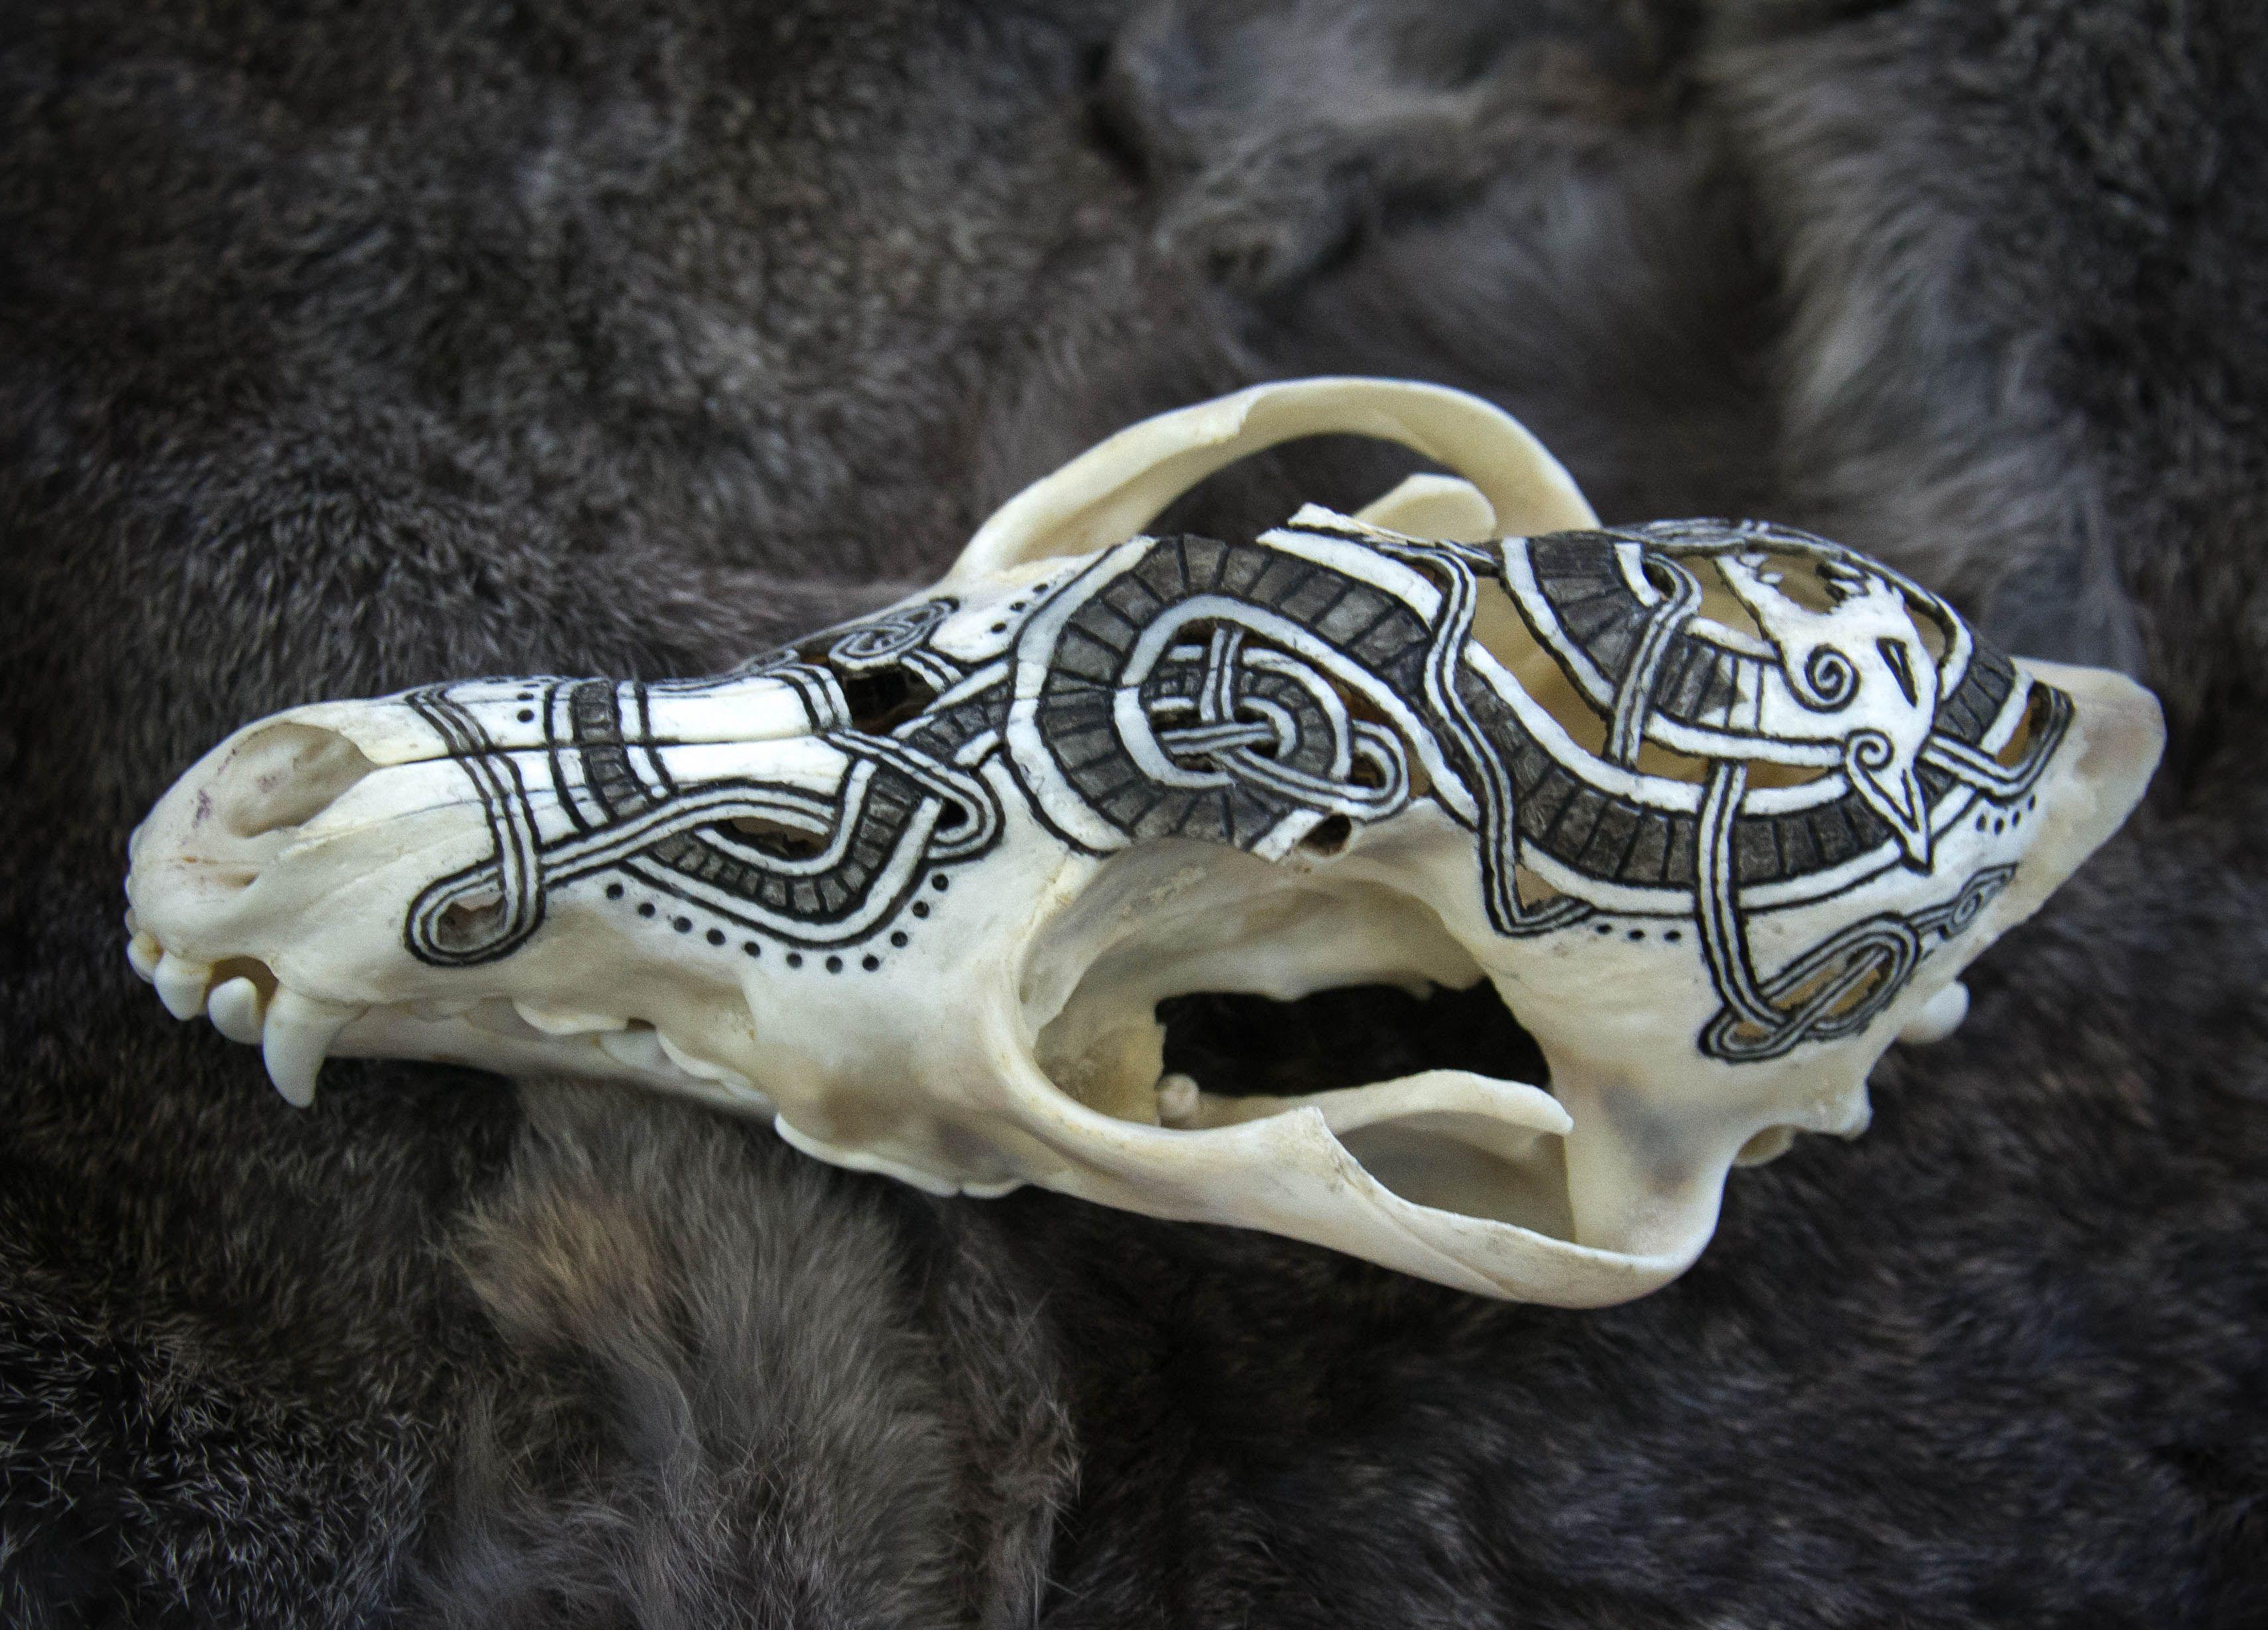 Carved Coyote Skull Skull Carving Skull Painting Skull